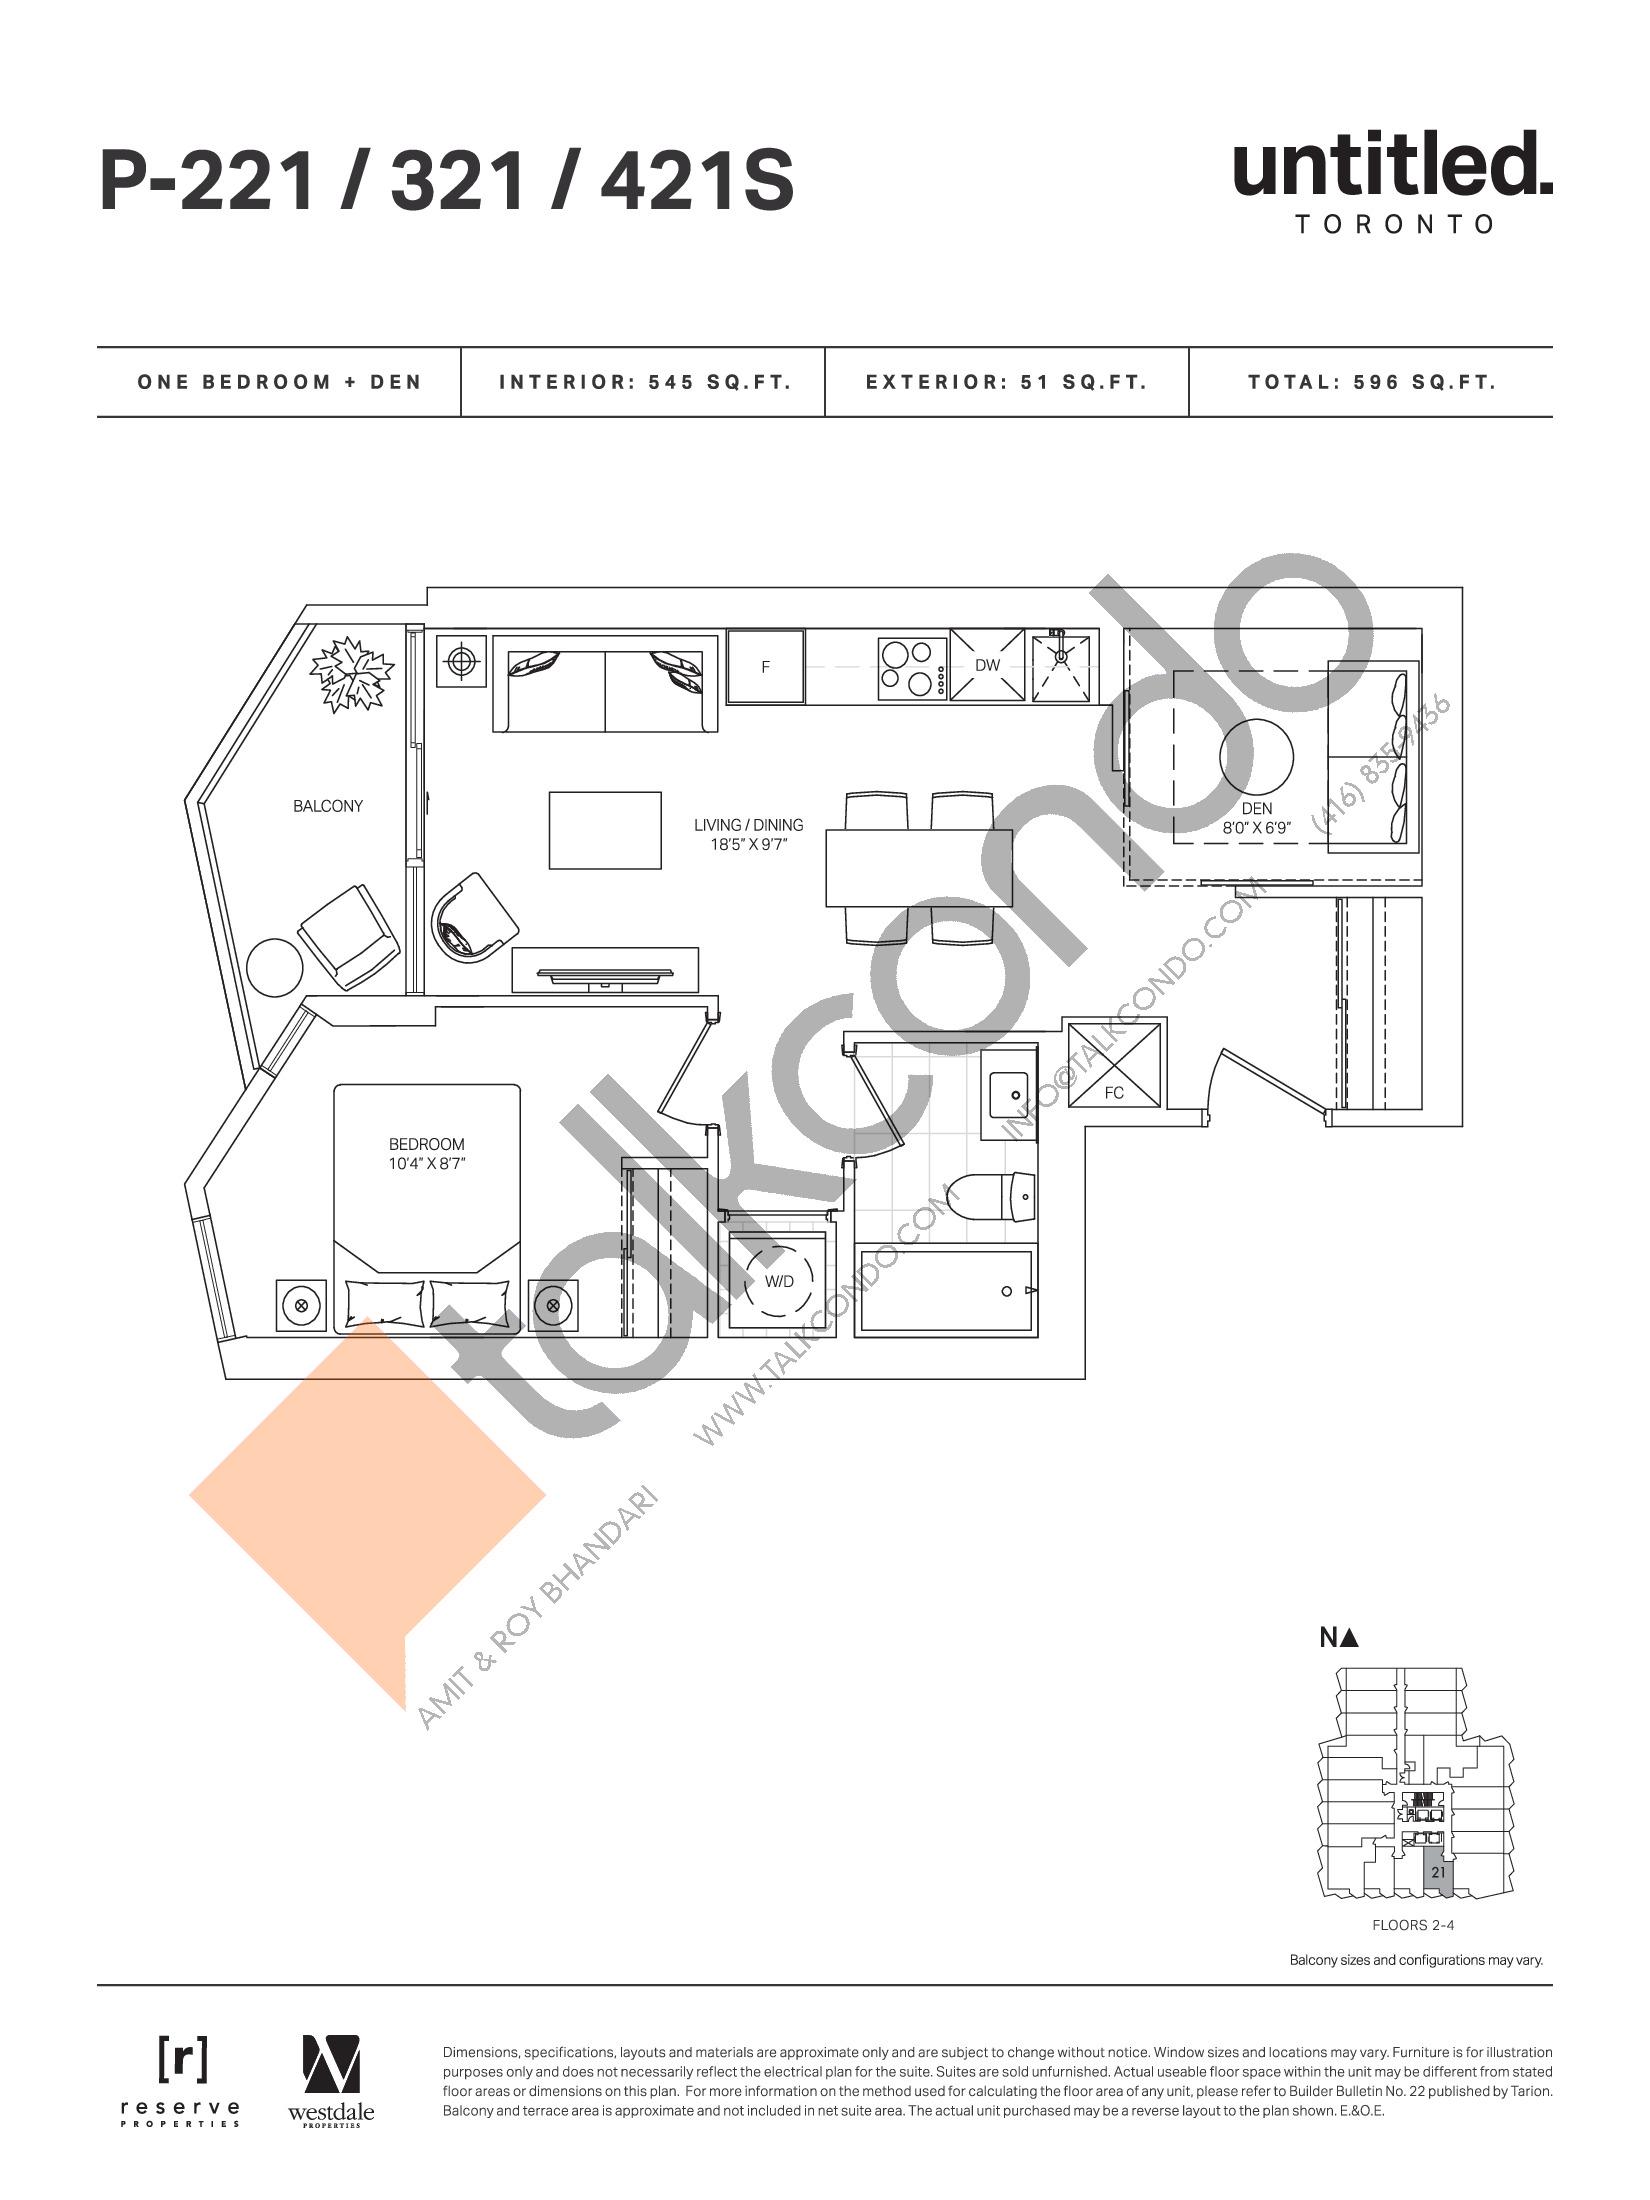 P-221 / 321 / 421S Floor Plan at Untitled Toronto Condos - 545 sq.ft